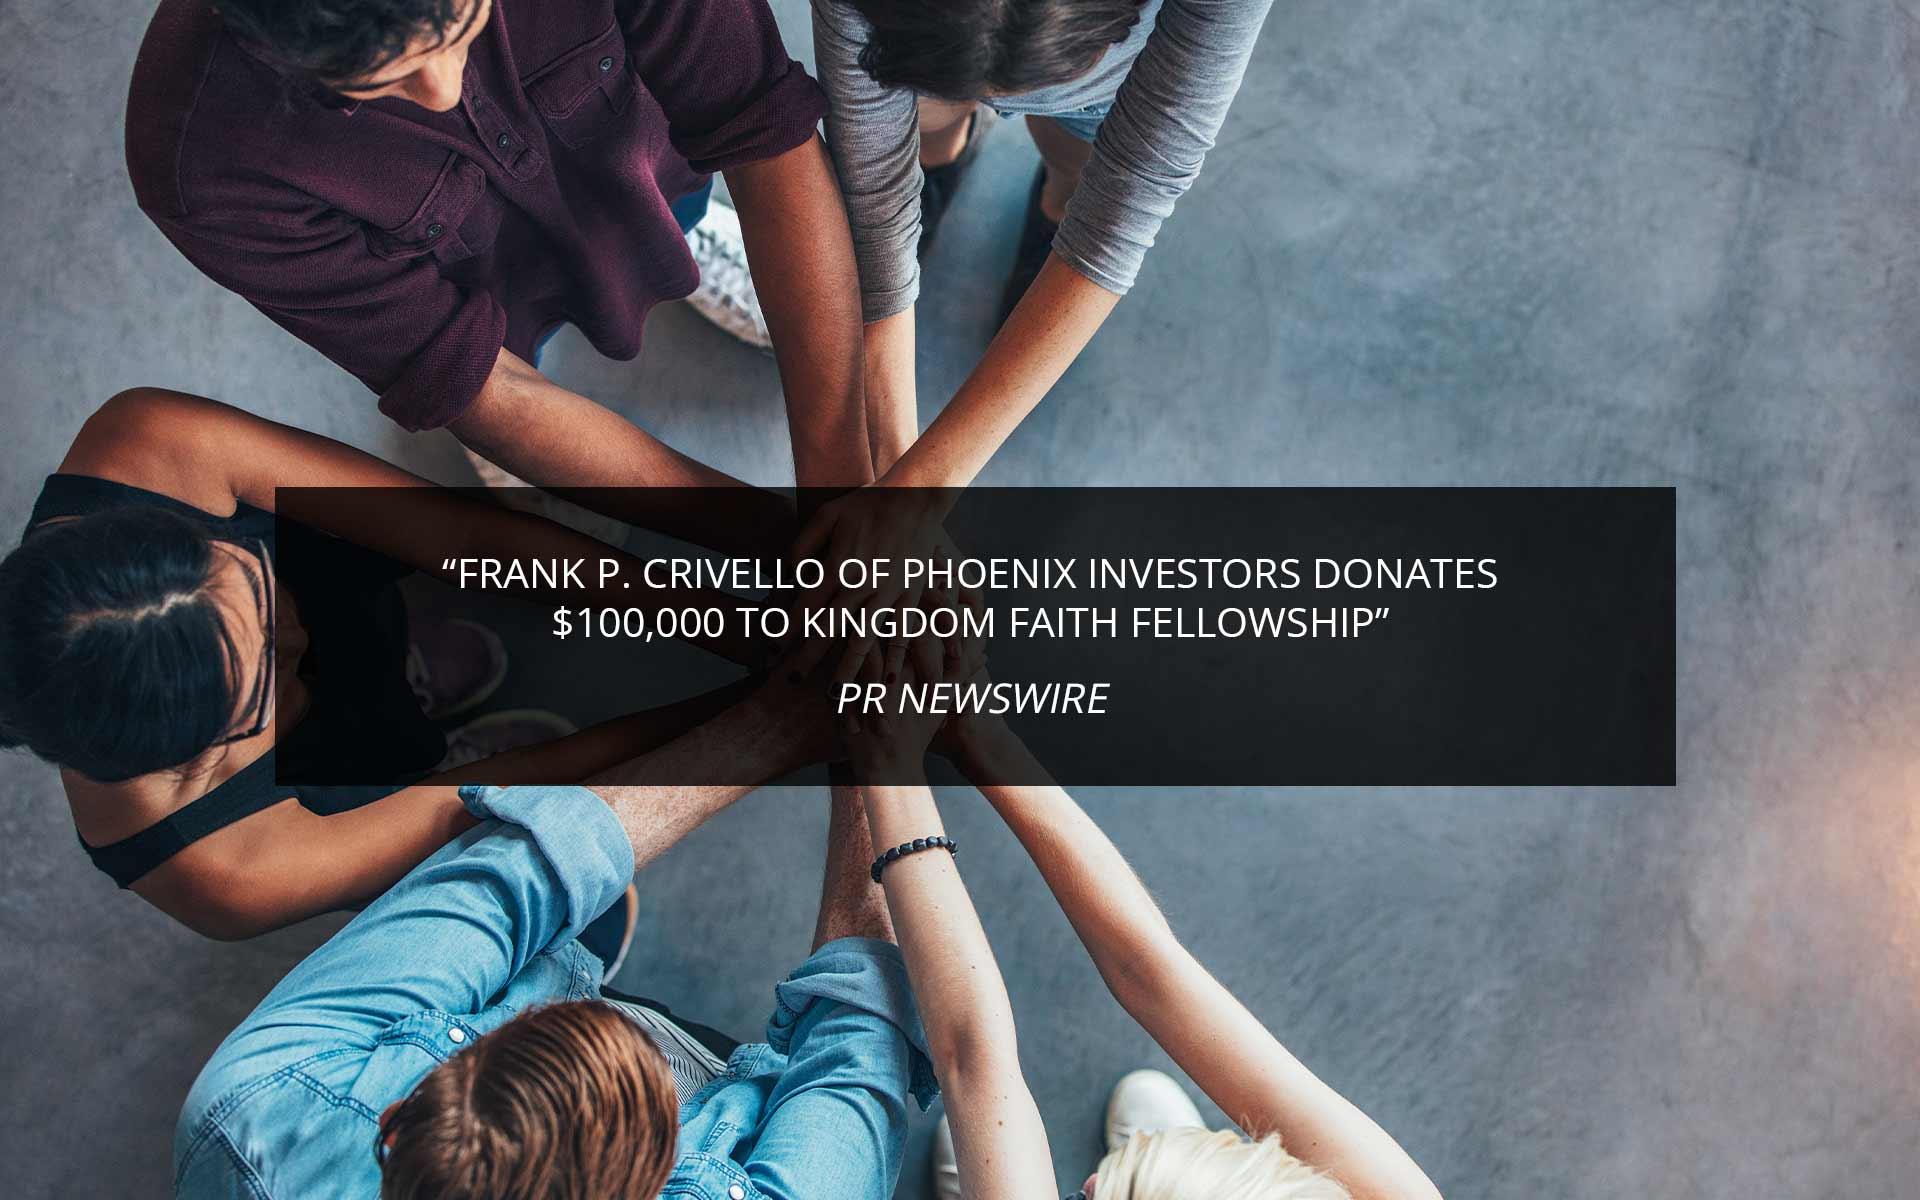 Frank P. Crivello Donates to Kingdom Faith Fellowship